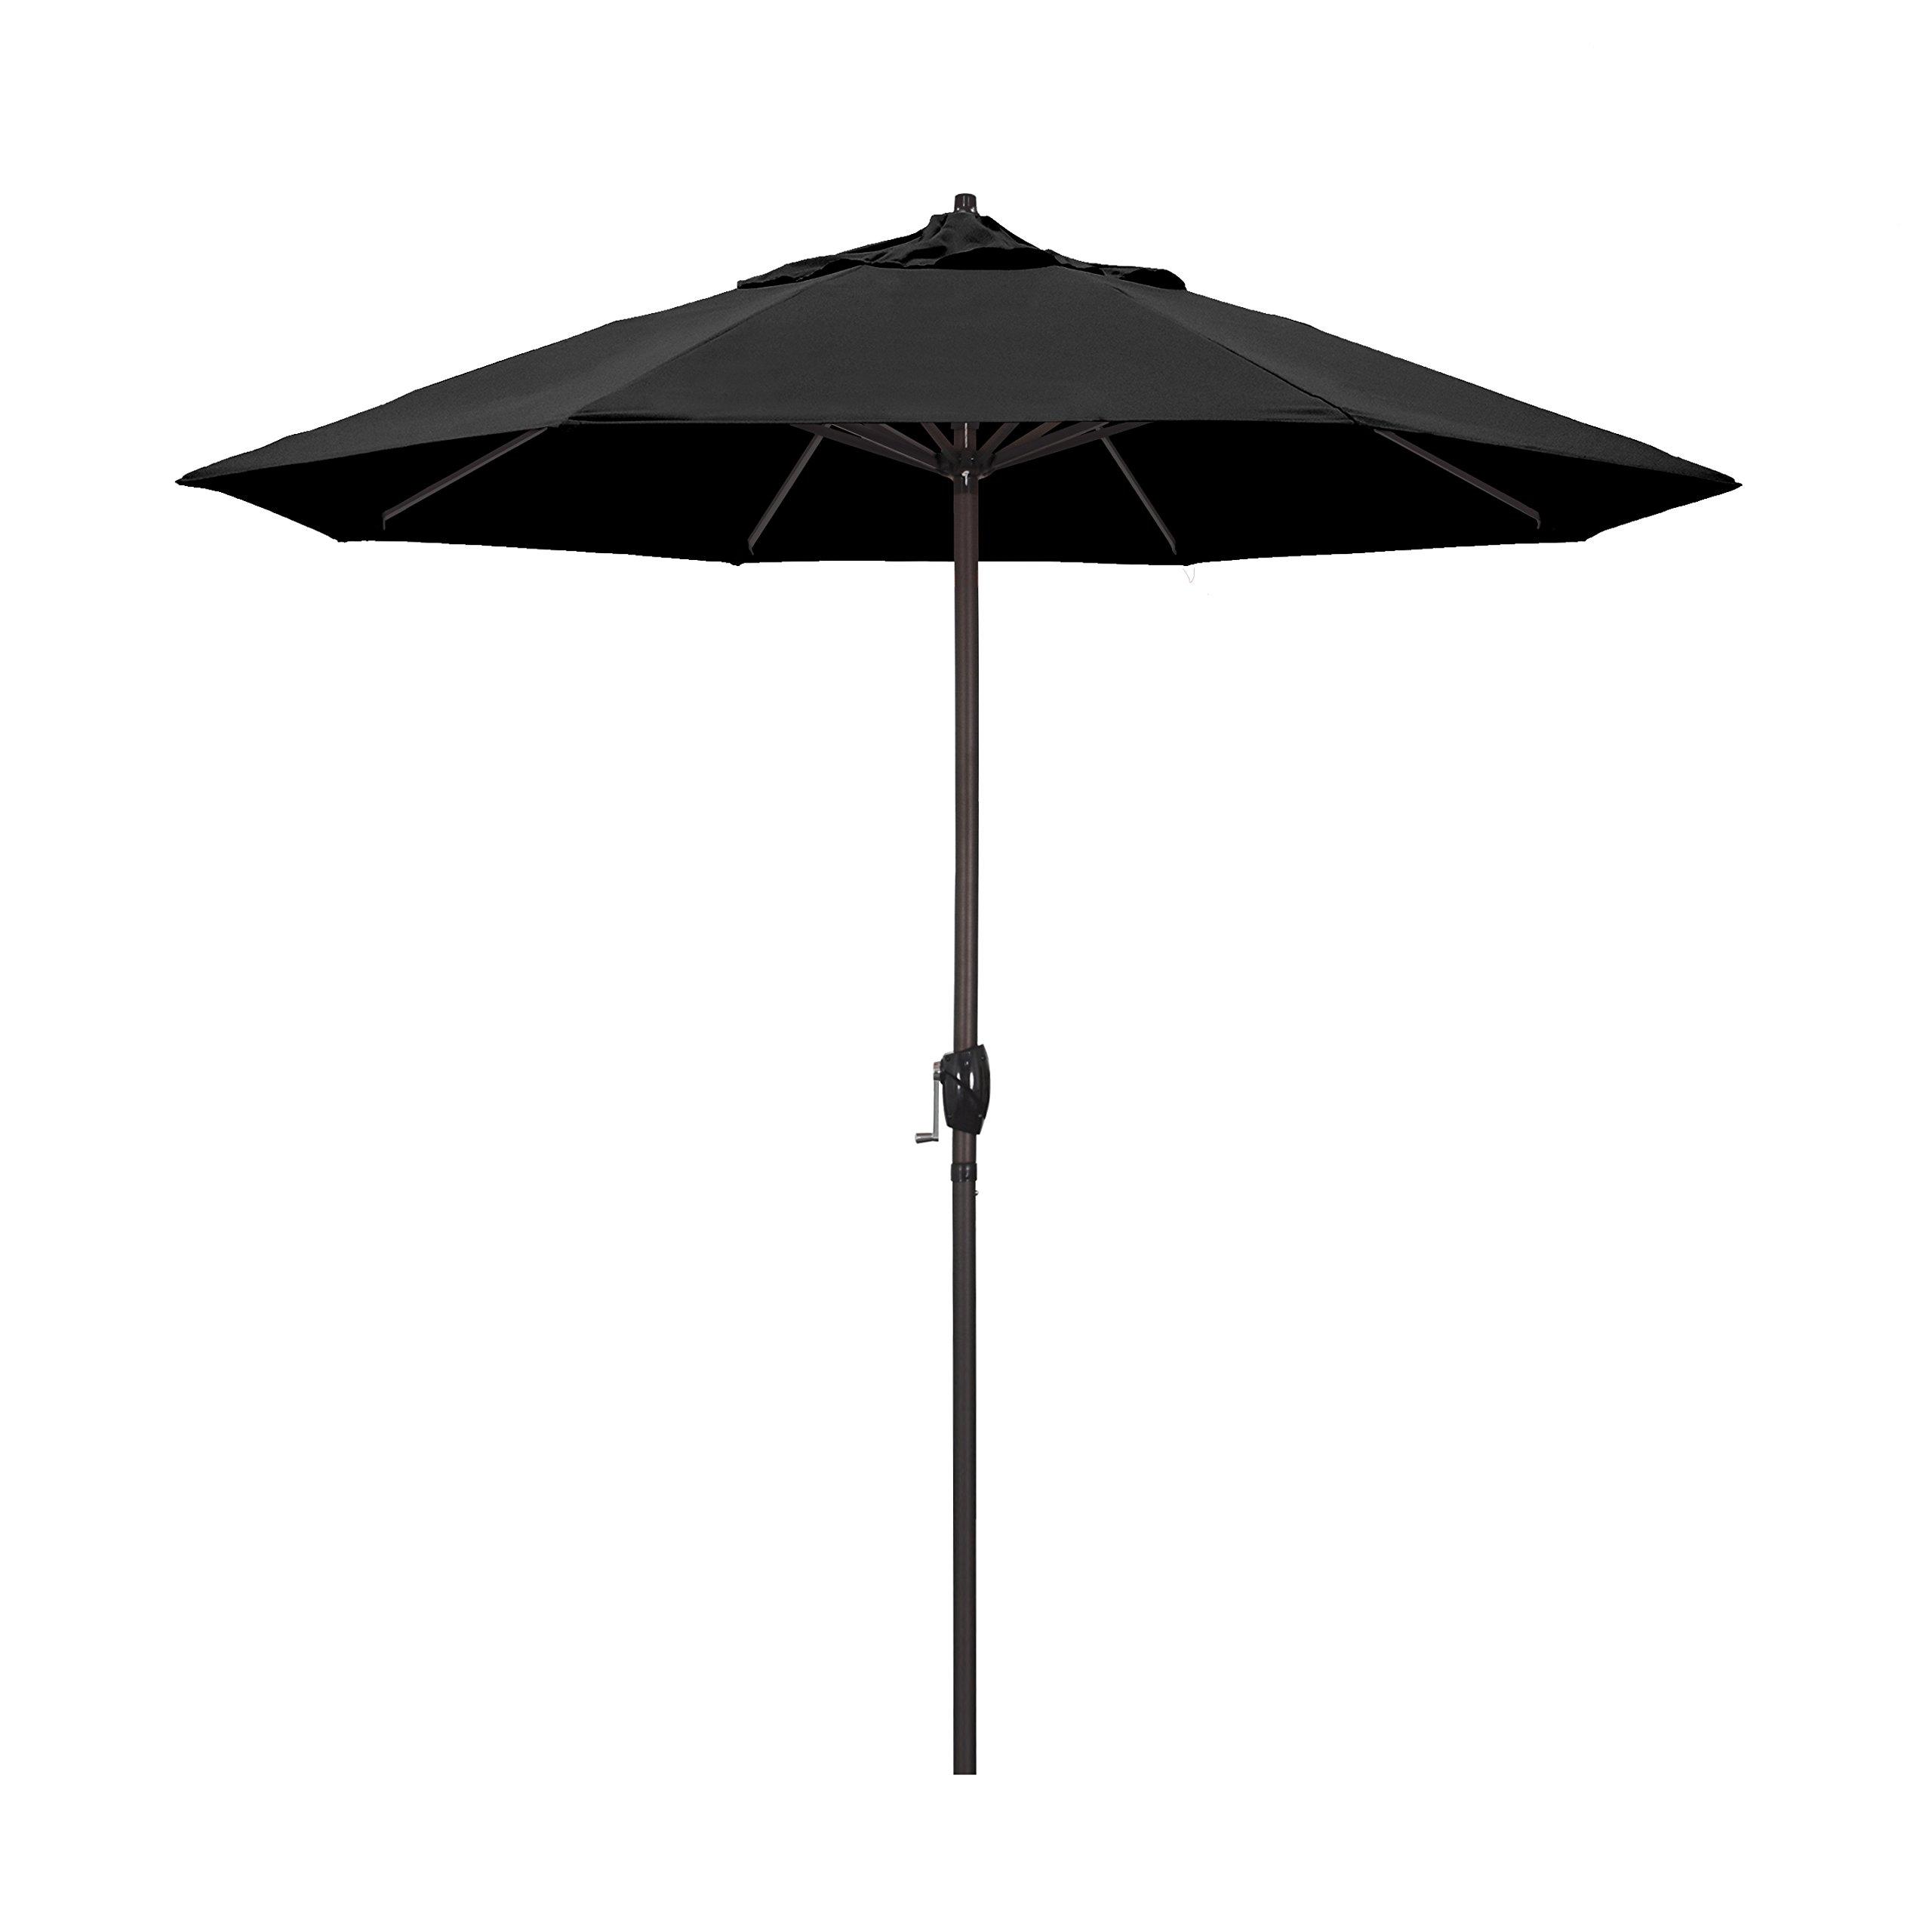 California Umbrella 9' Round Aluminum Market Umbrella, Crank Lift, Auto Tilt, Bronze Pole, Black Olefin